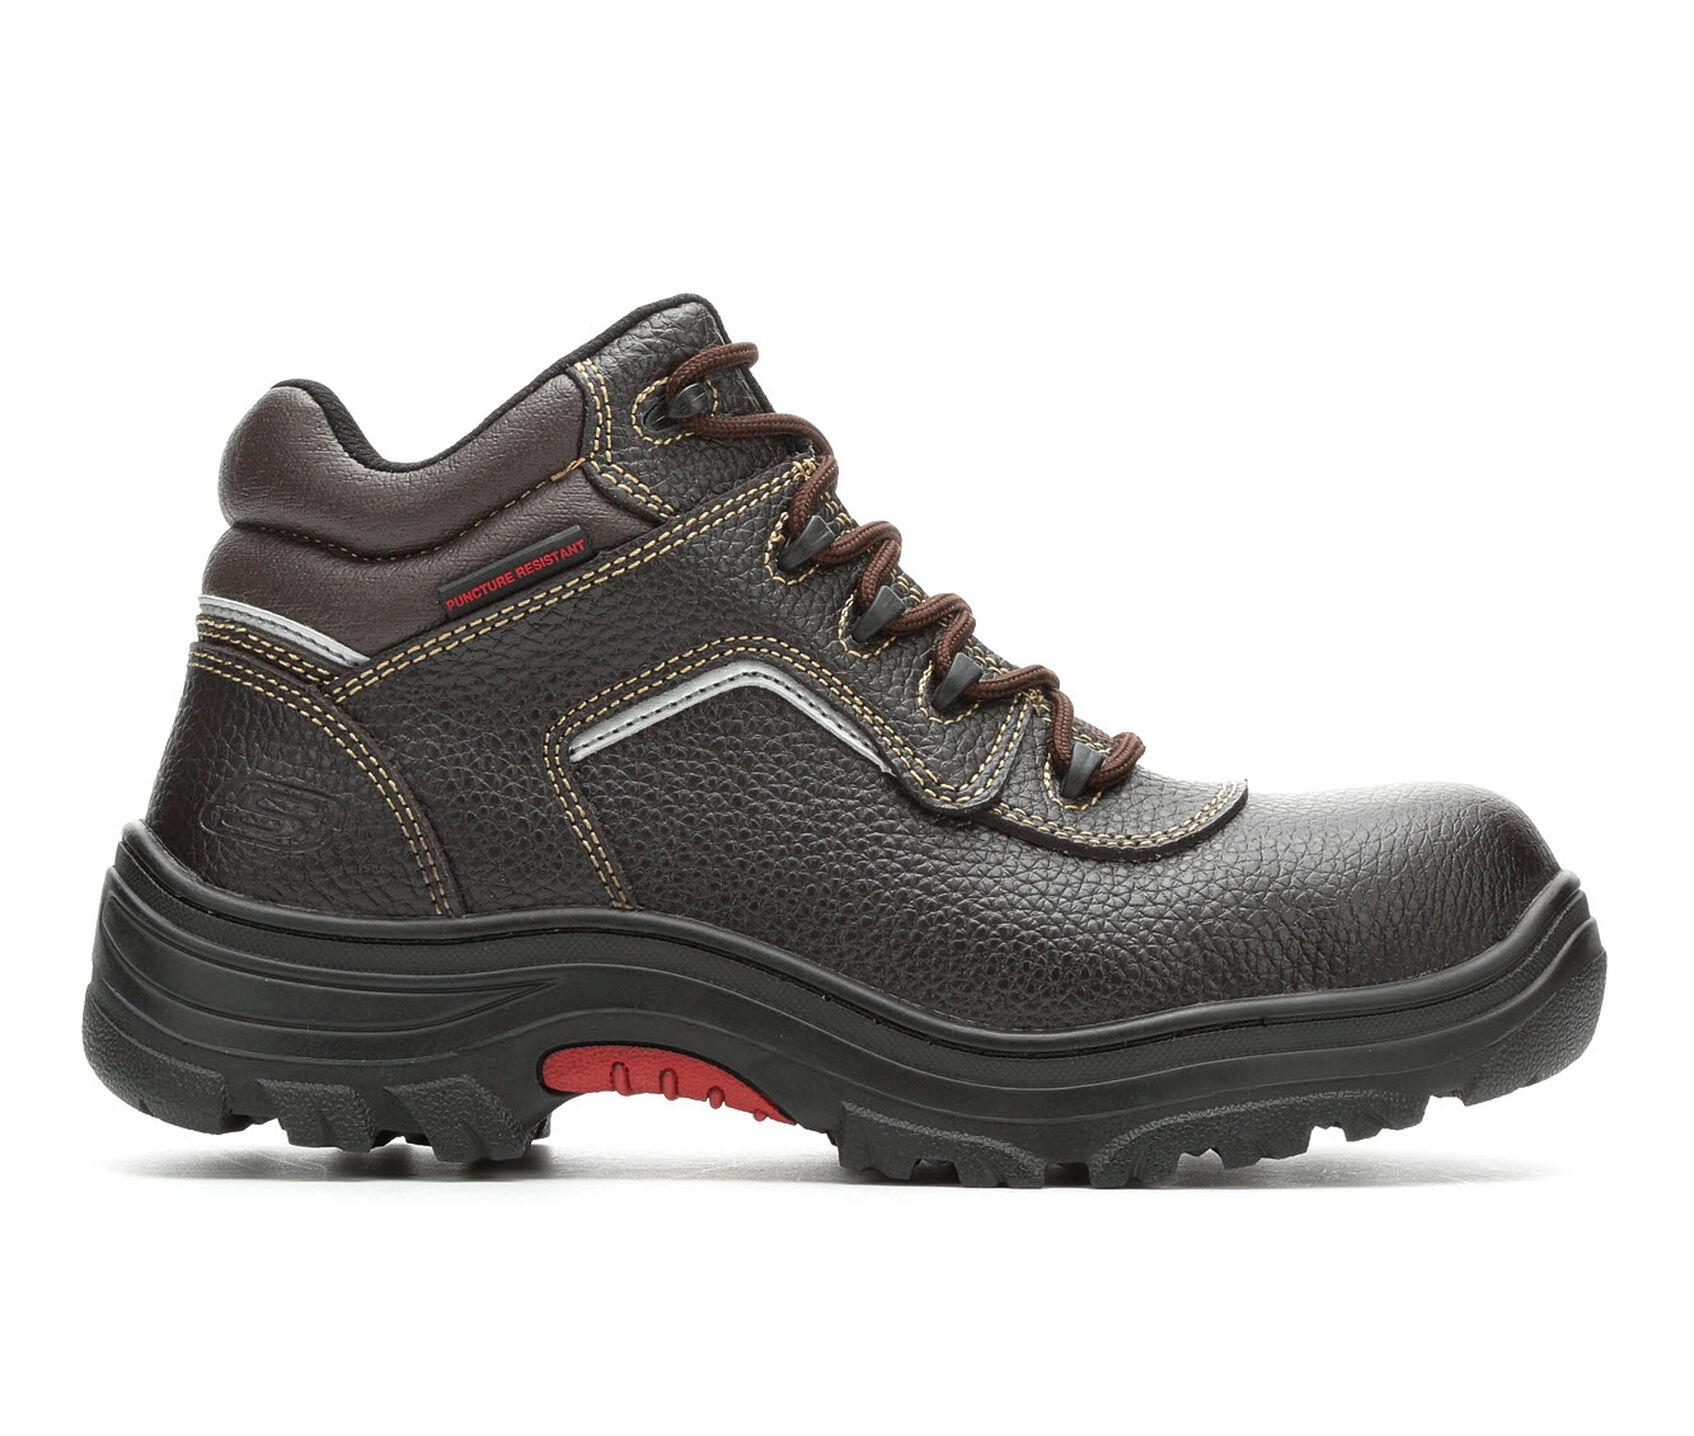 4aaeeae1b6f4 Men s Skechers Work Workshire Burgin Sosder 77144 Work Boots